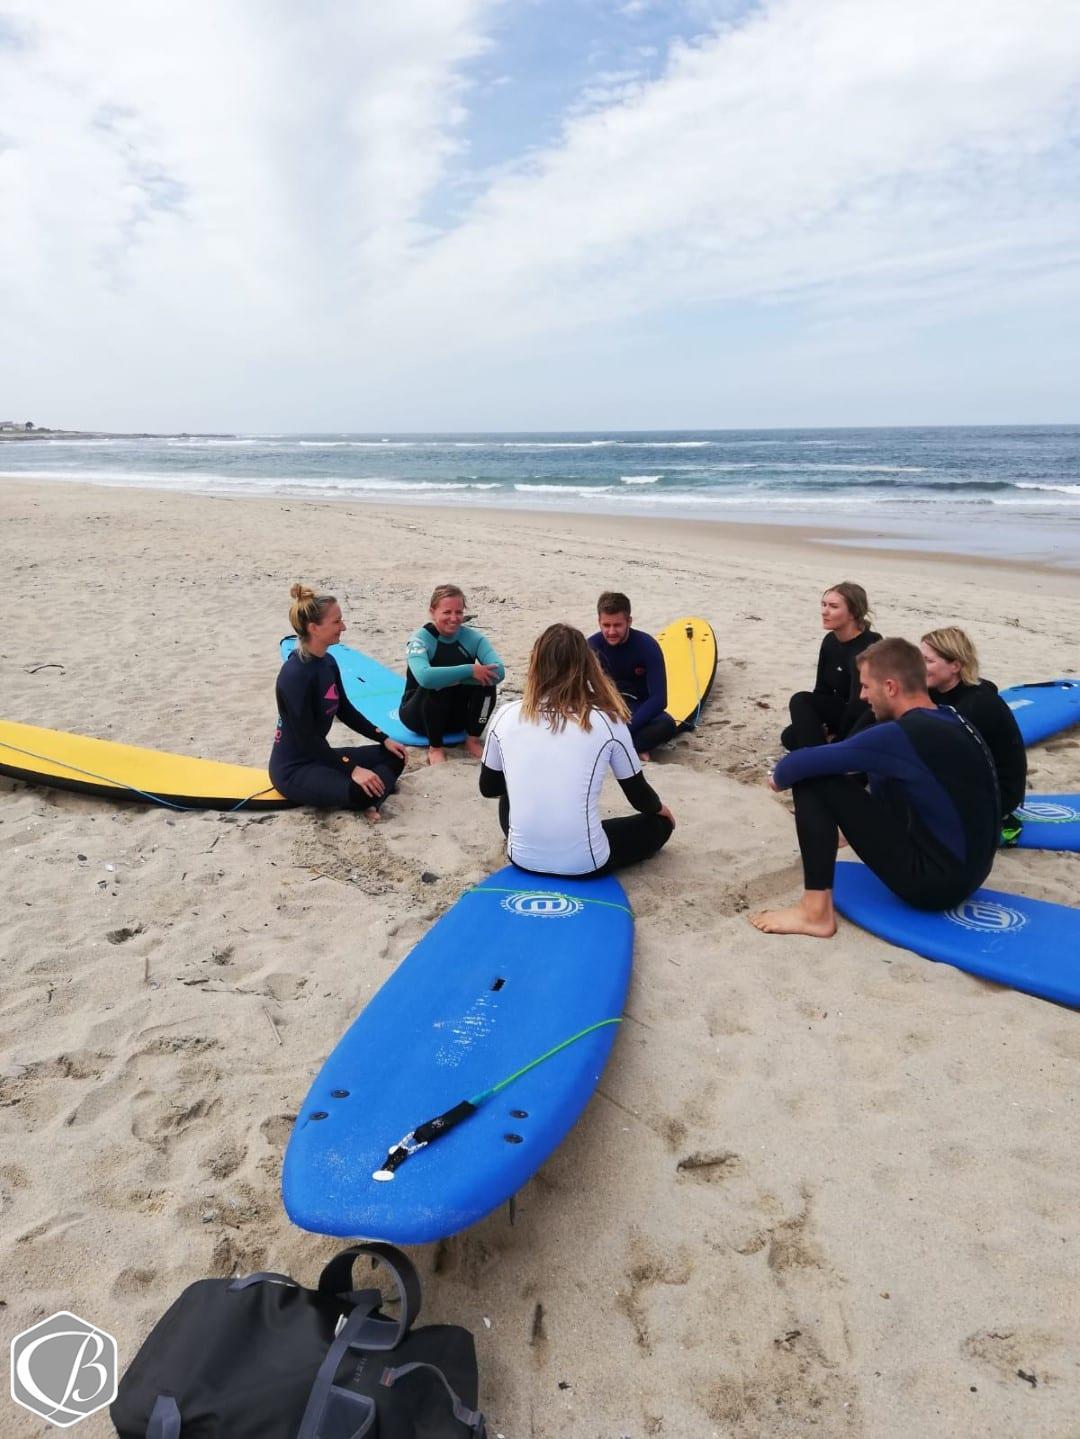 Portugal Moledo Fitnessreise Surfen Wellenreiten Meer Sonne